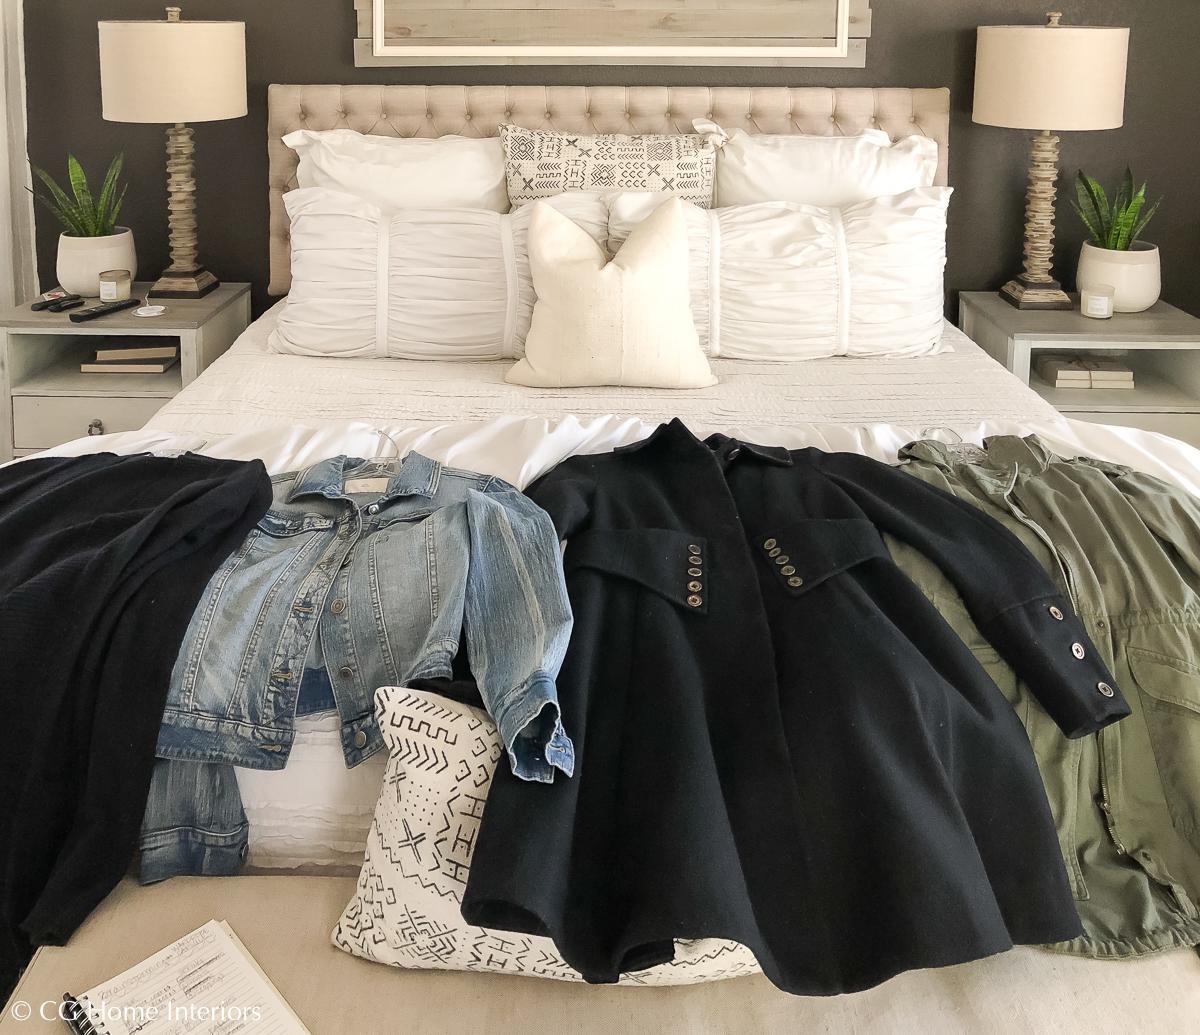 Capsule Wardrobe, Minimalism, Simple Living